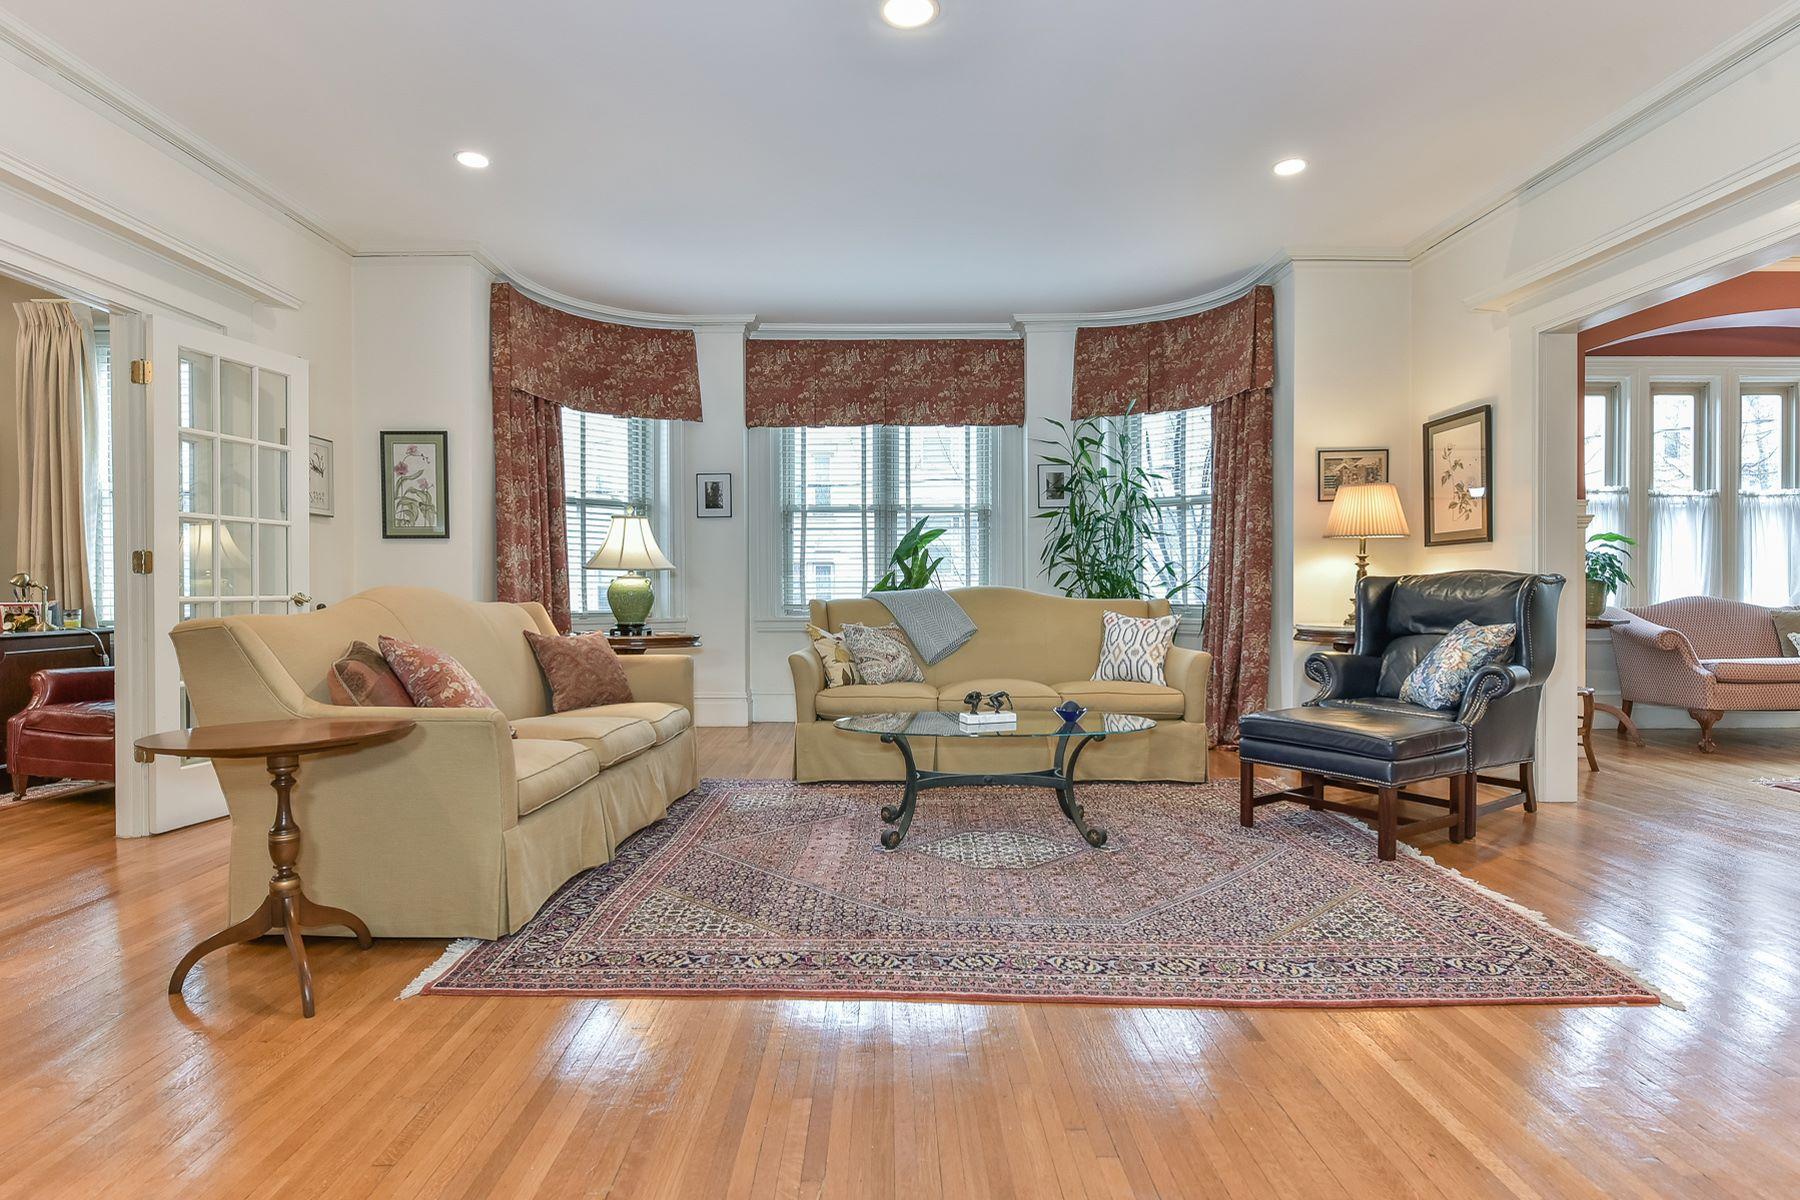 Condominio per Vendita alle ore 195 Saint Paul St 3, Brookline Brookline, Massachusetts, 02446 Stati Uniti